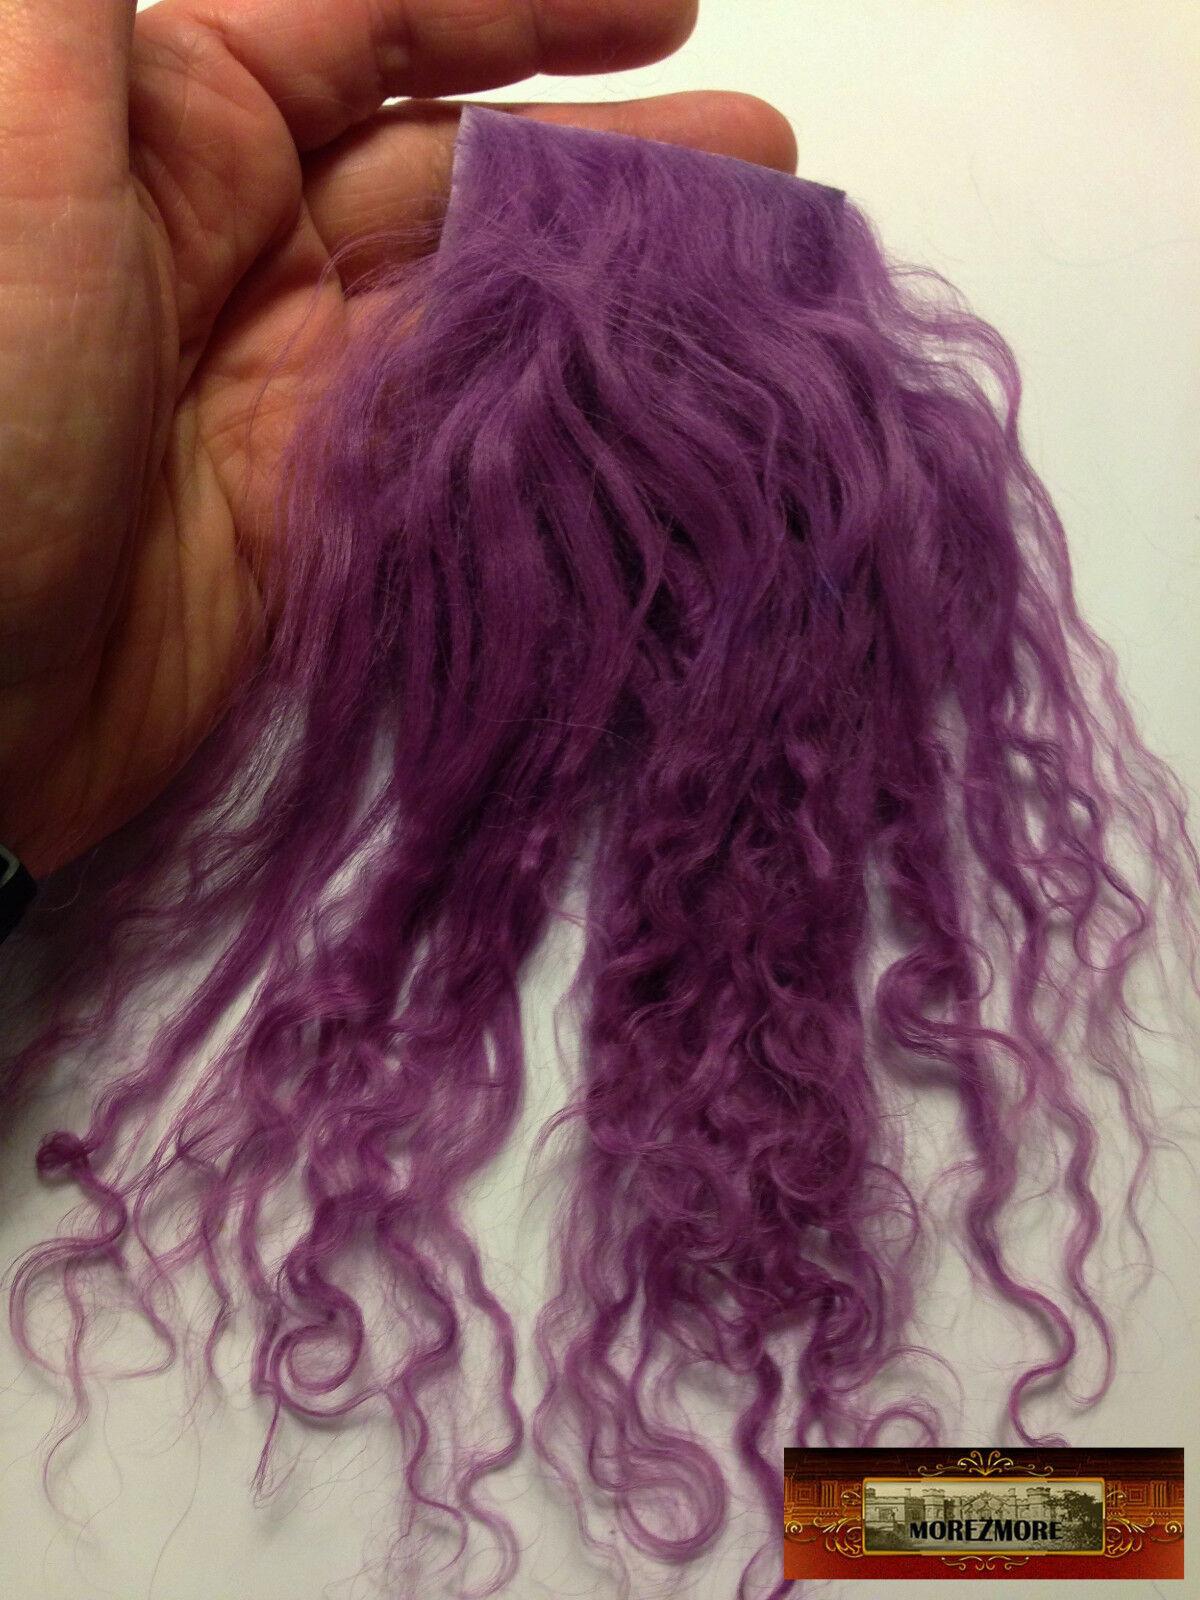 M01179 MOREZMORE Tibetan Lamb Fur Mini Sample 2x2 RAVEN BLACK Doll Hair A60